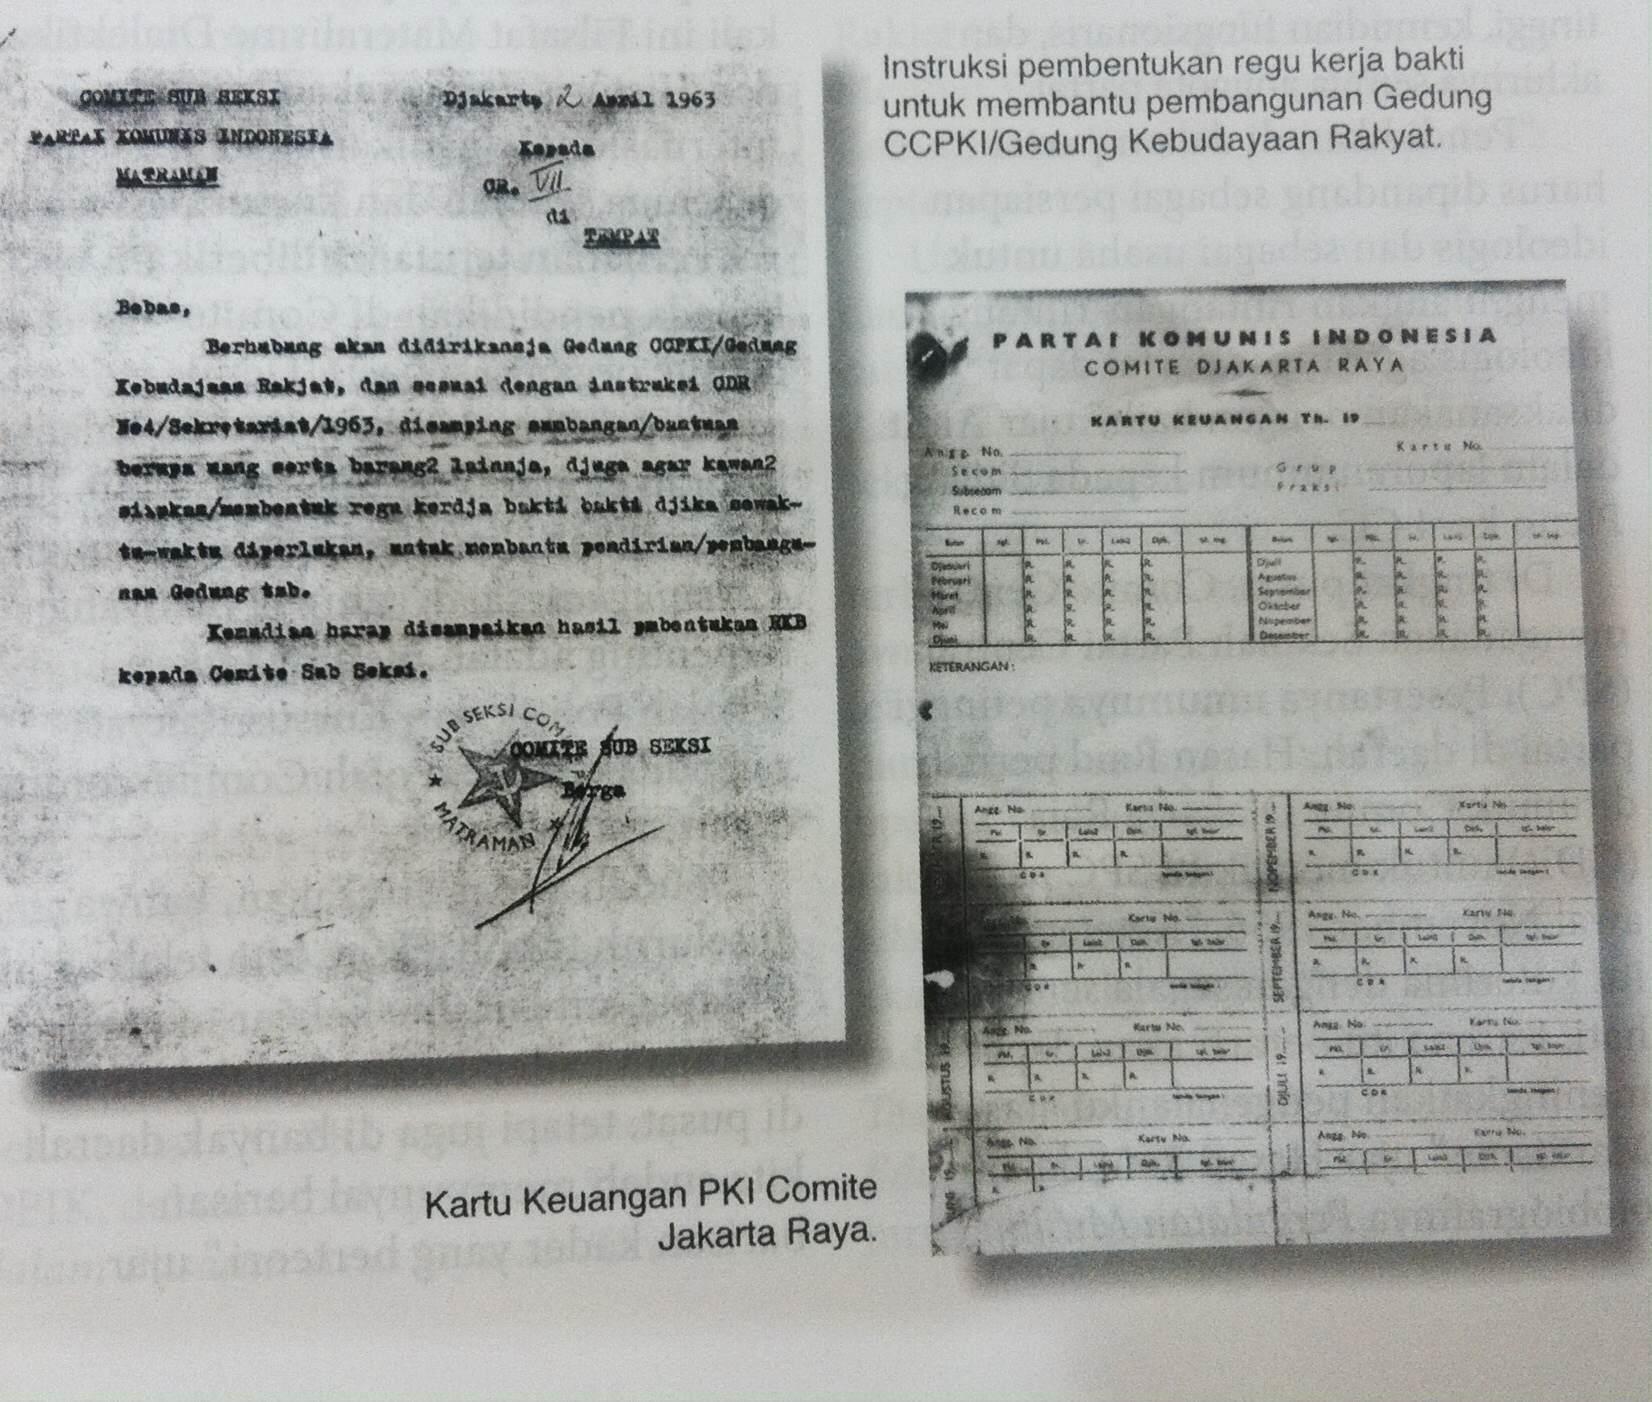 Asal-usul Dana Partai Komunis Indonesia